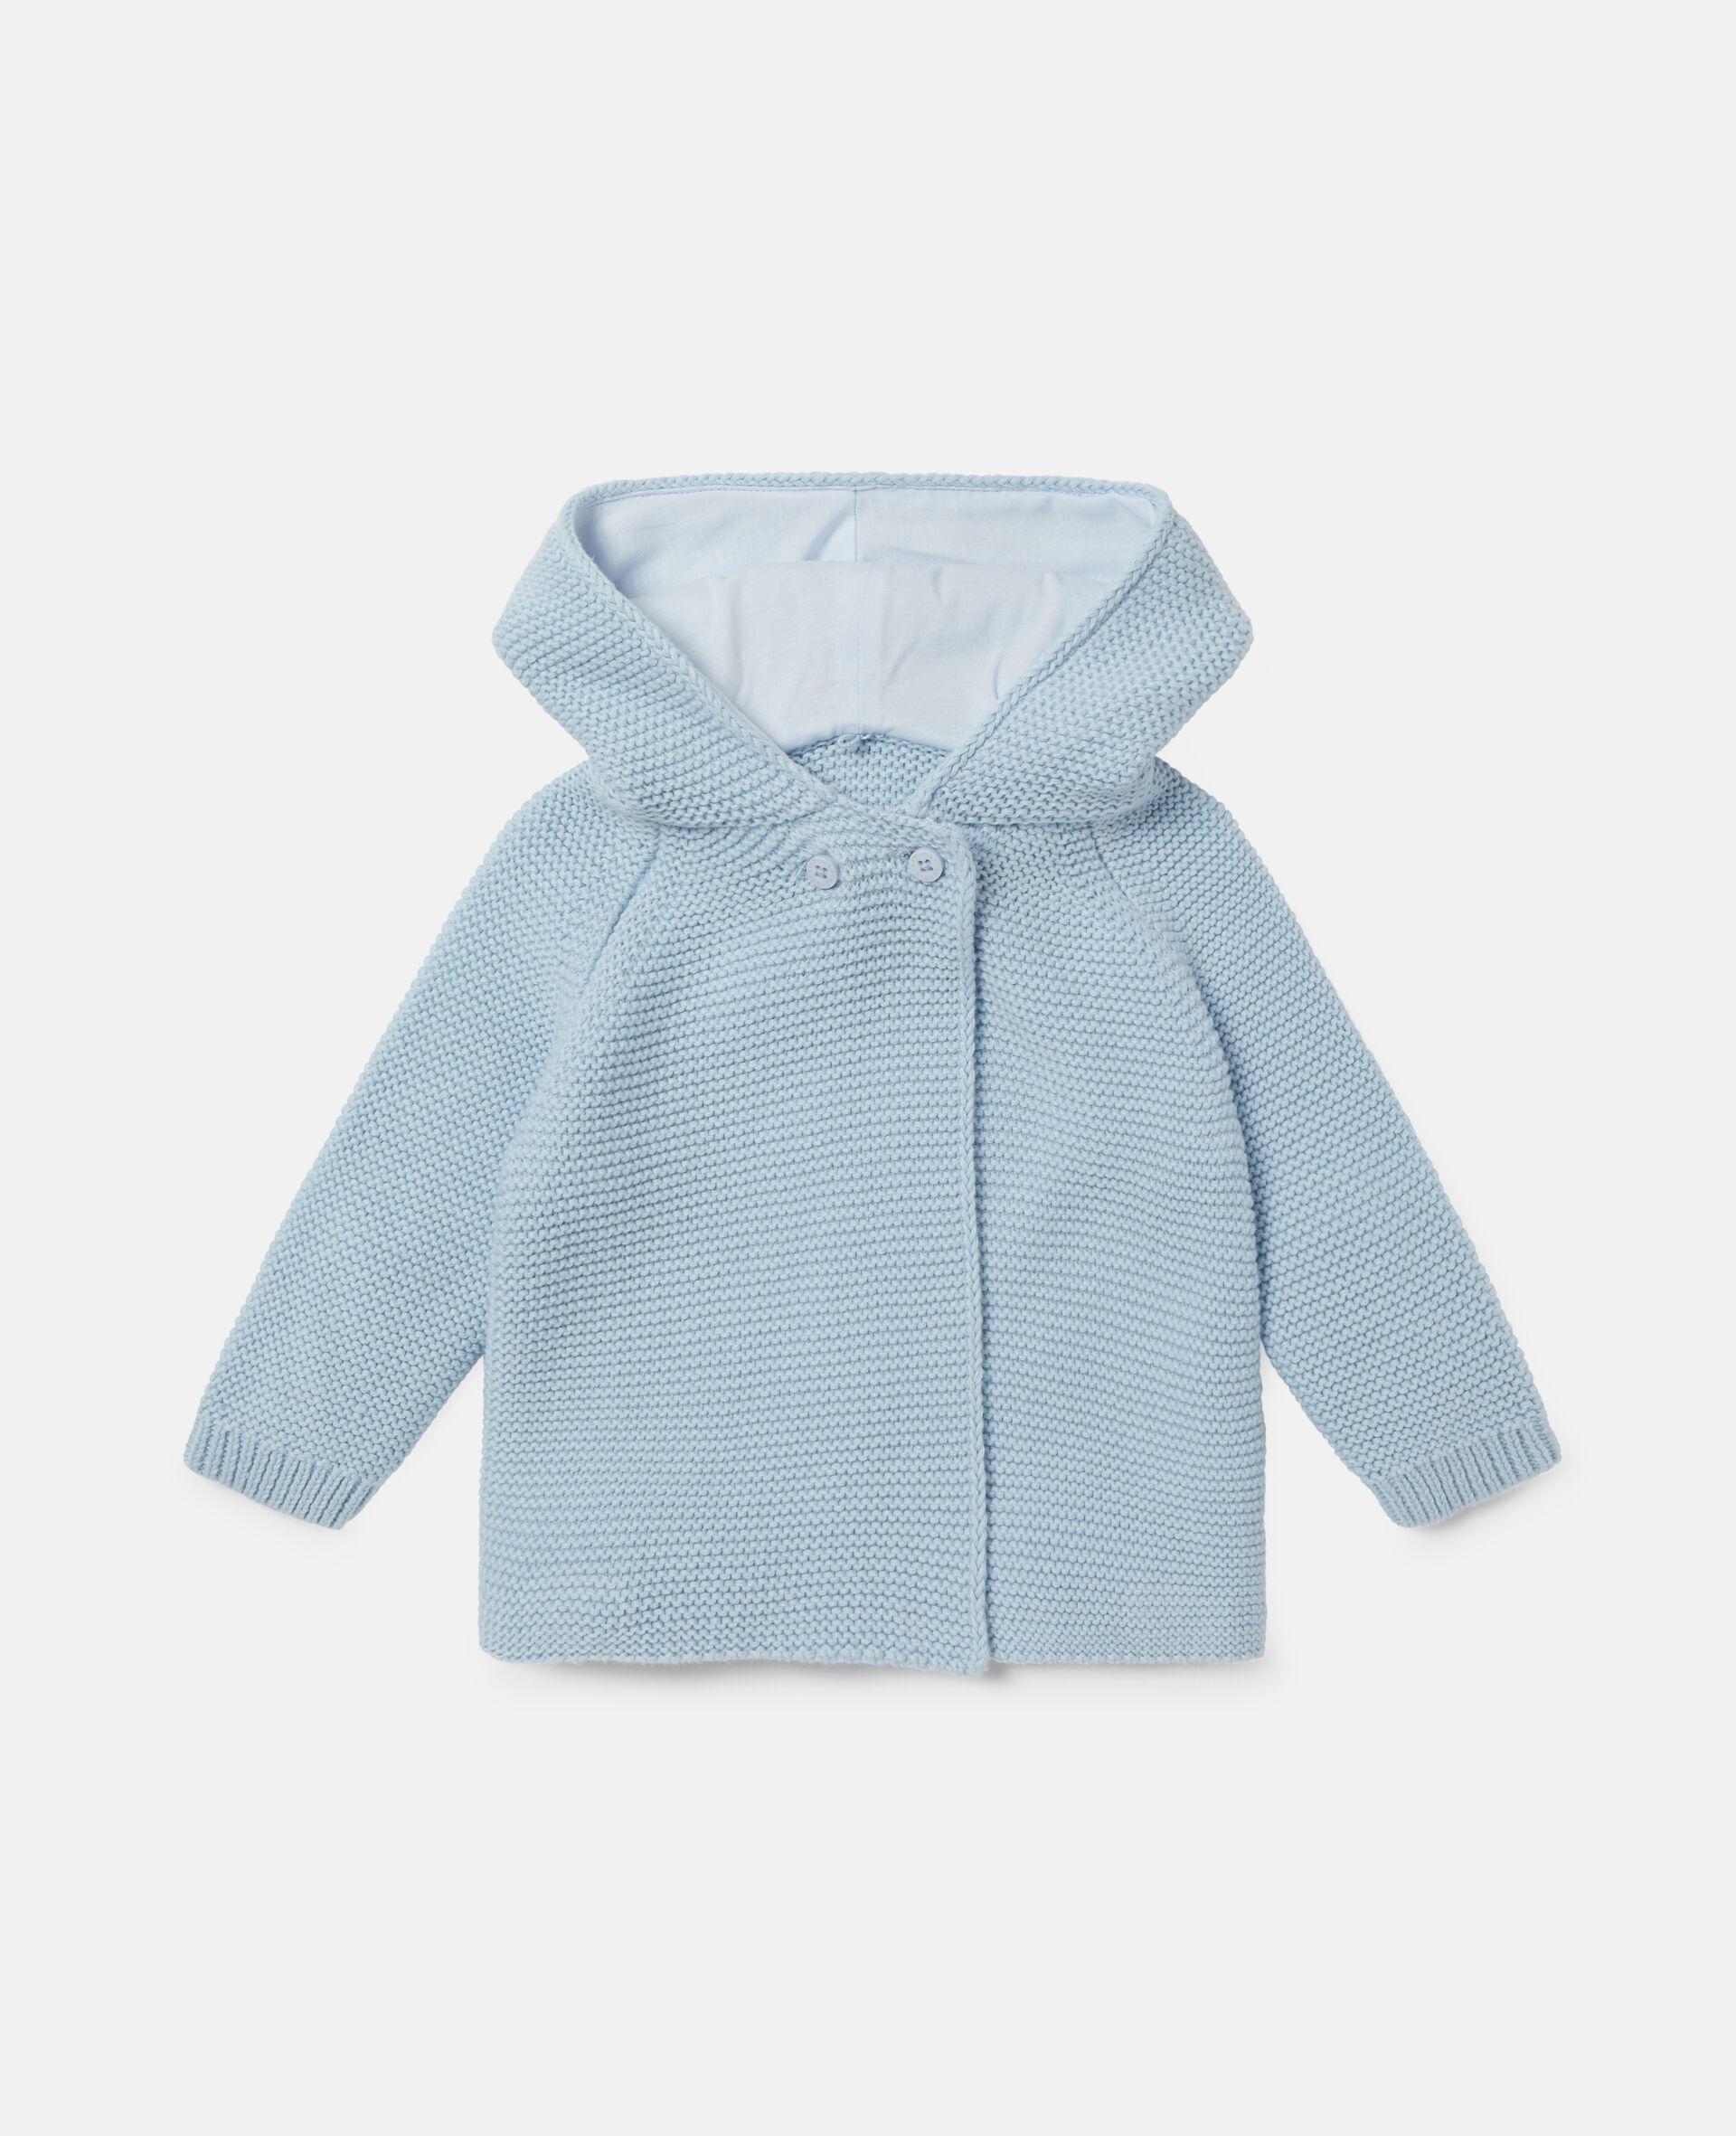 Doggie Knit Cardigan-Blue-large image number 0